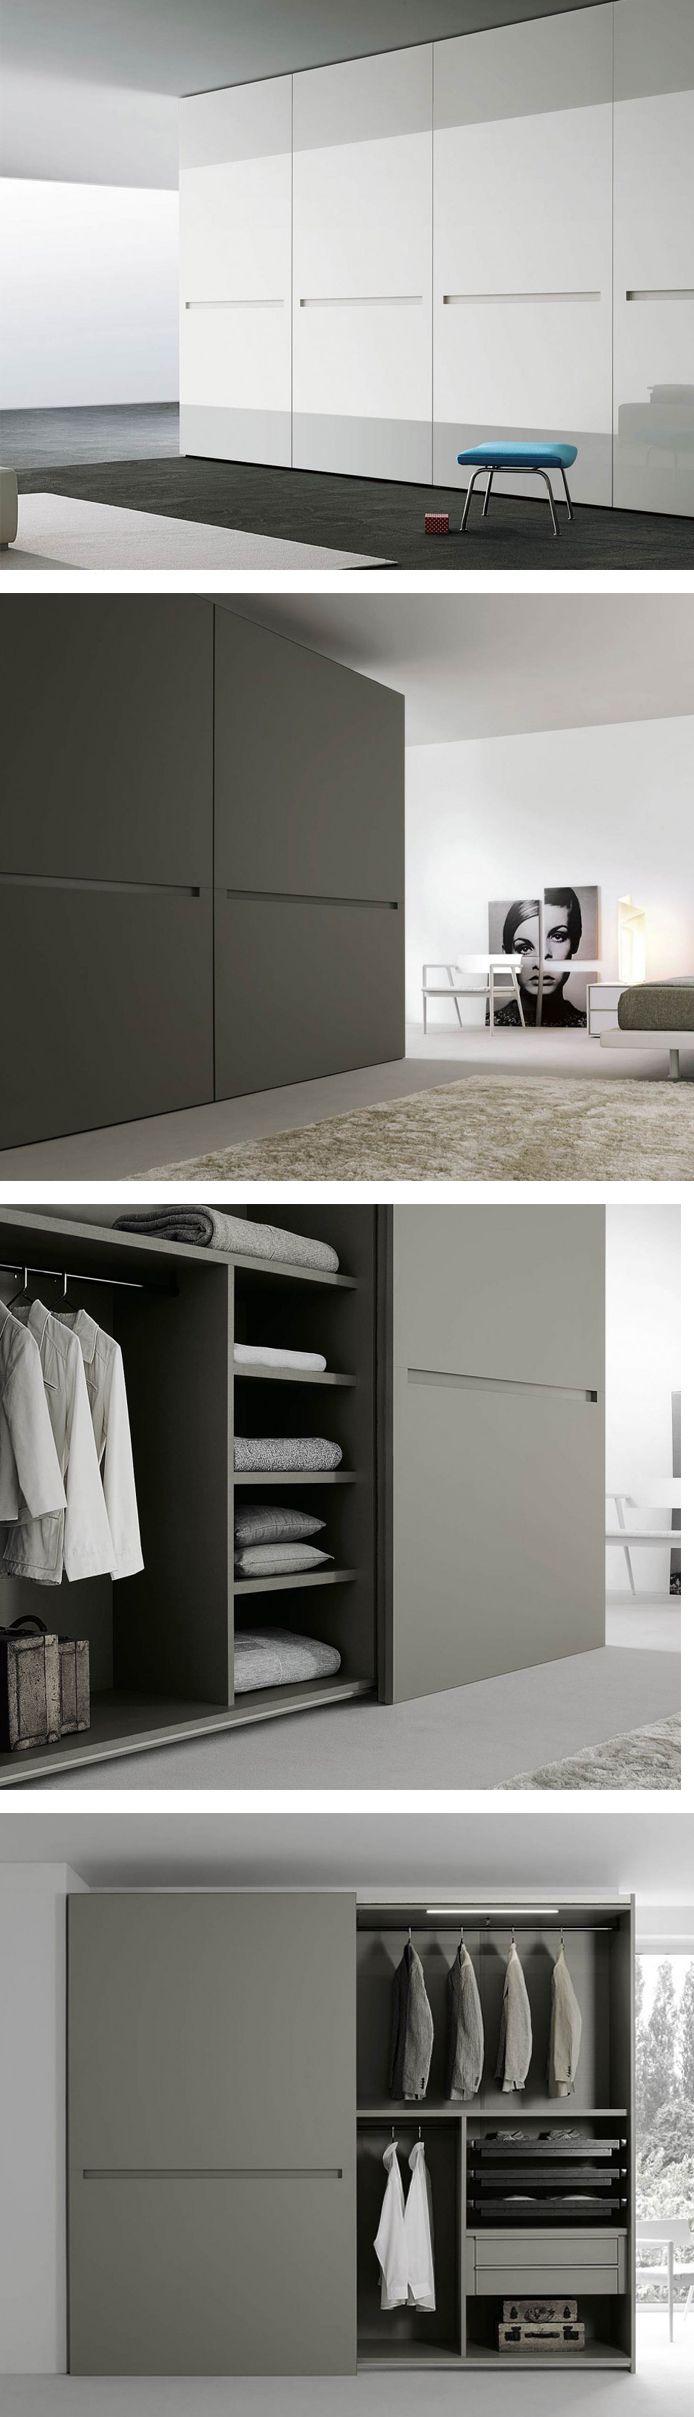 Fabulous PAX Kleiderschrank wei Ikea pax Pax wardrobe and Soft closing hinges